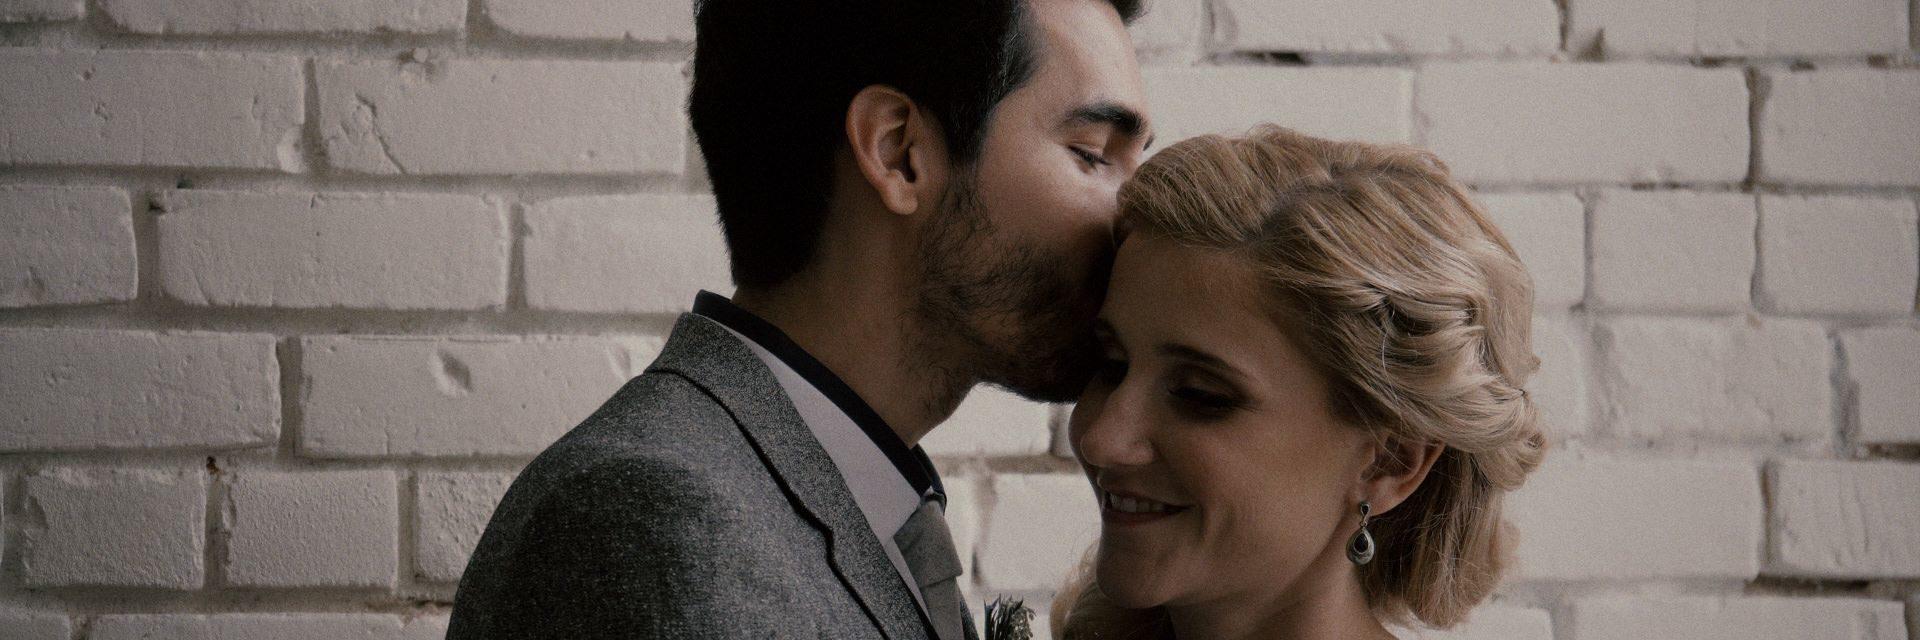 Bergen-wedding-videographer-cinemate-films-03